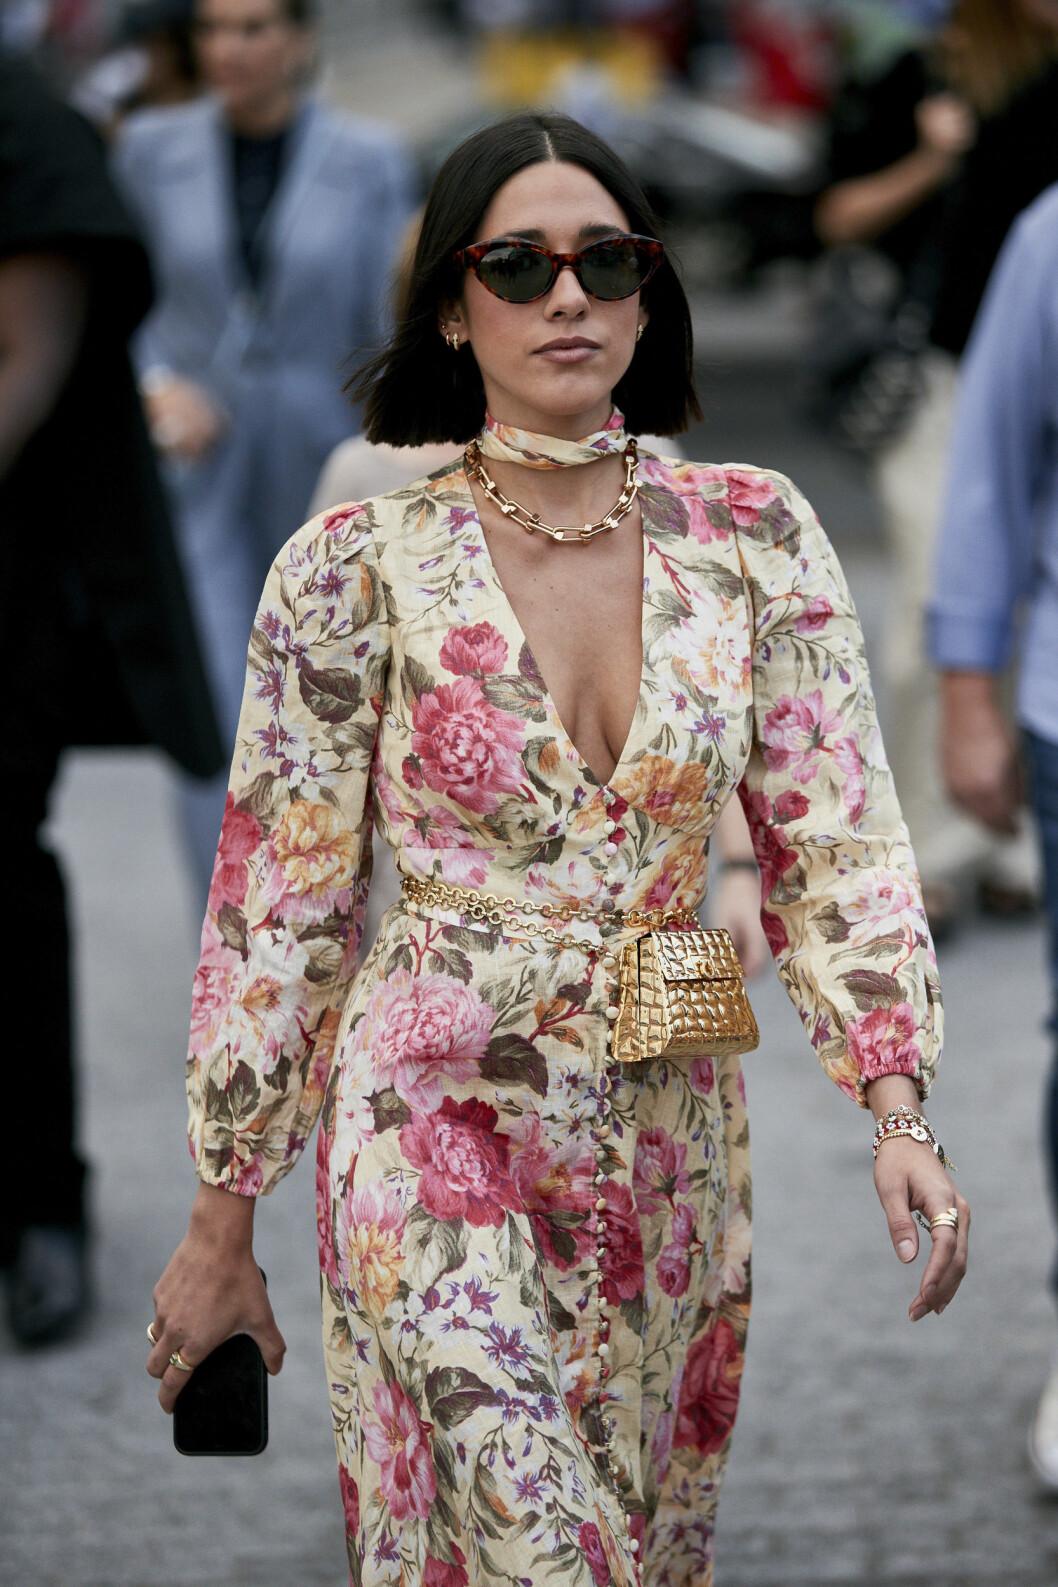 blommig klänning streetstyle.